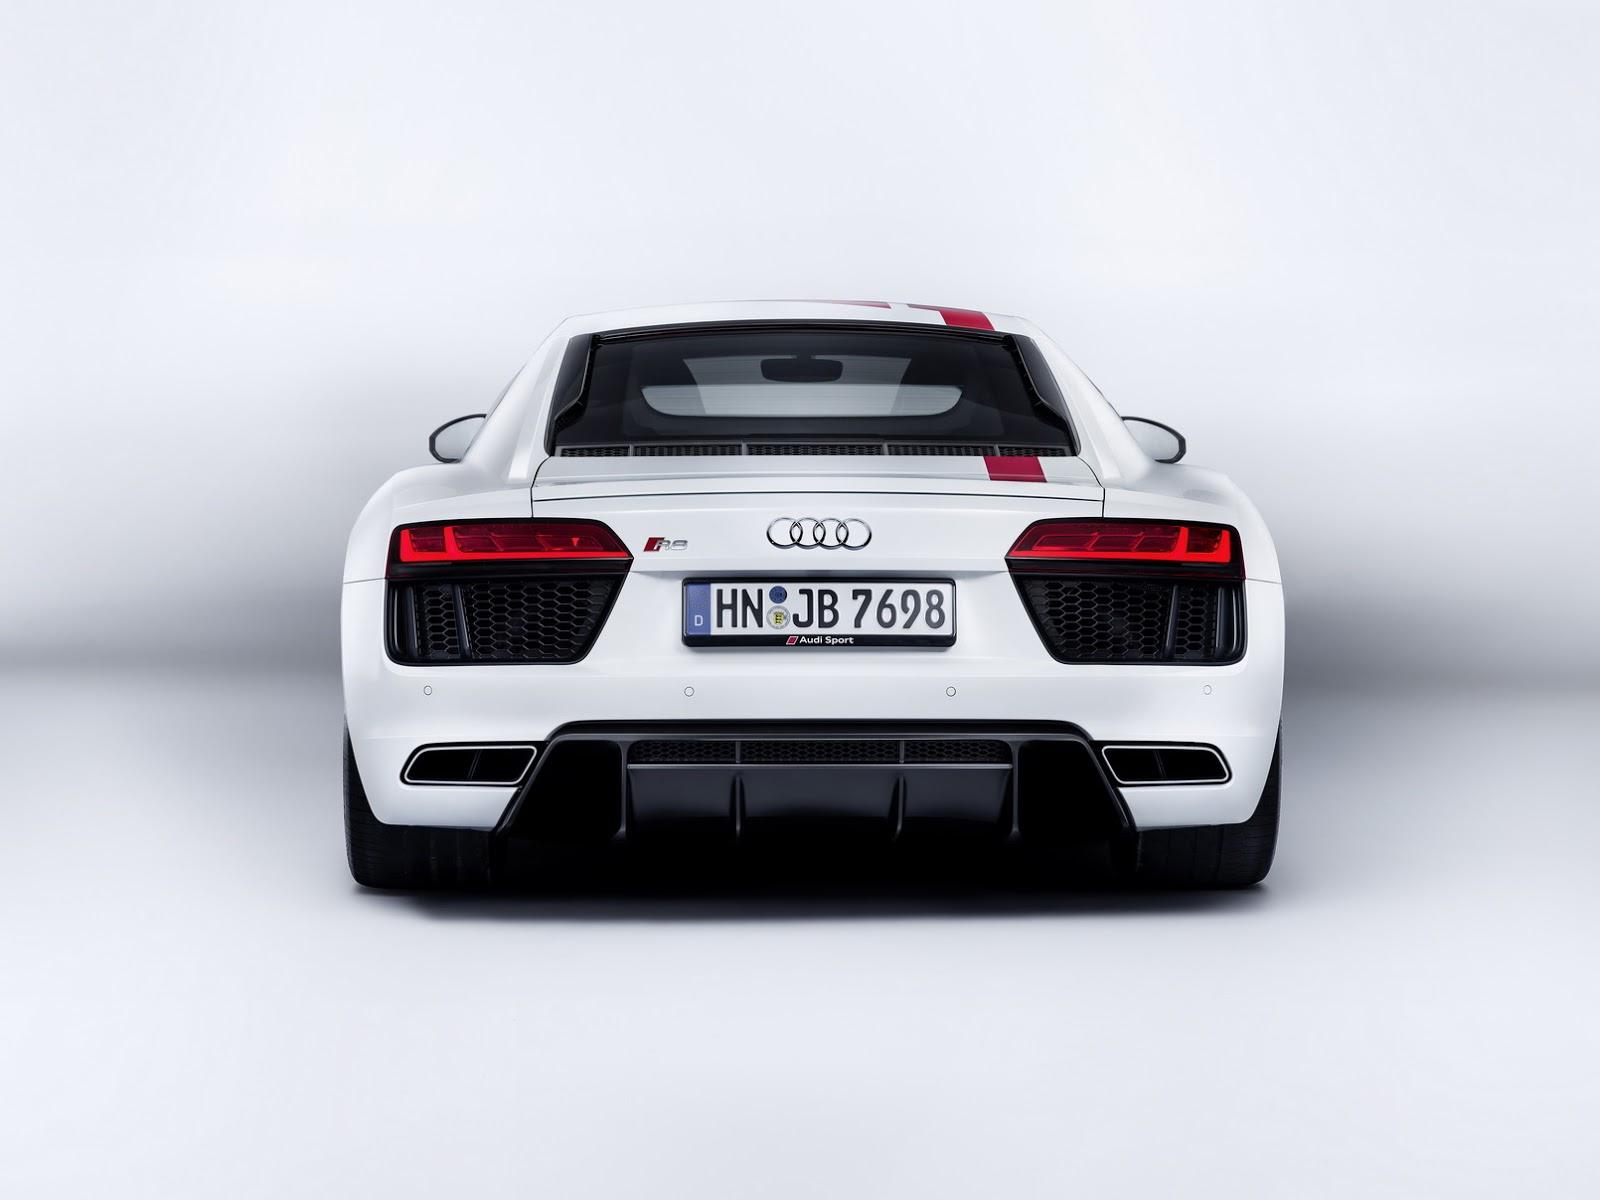 2018_Audi_R8_V10_RWS_39